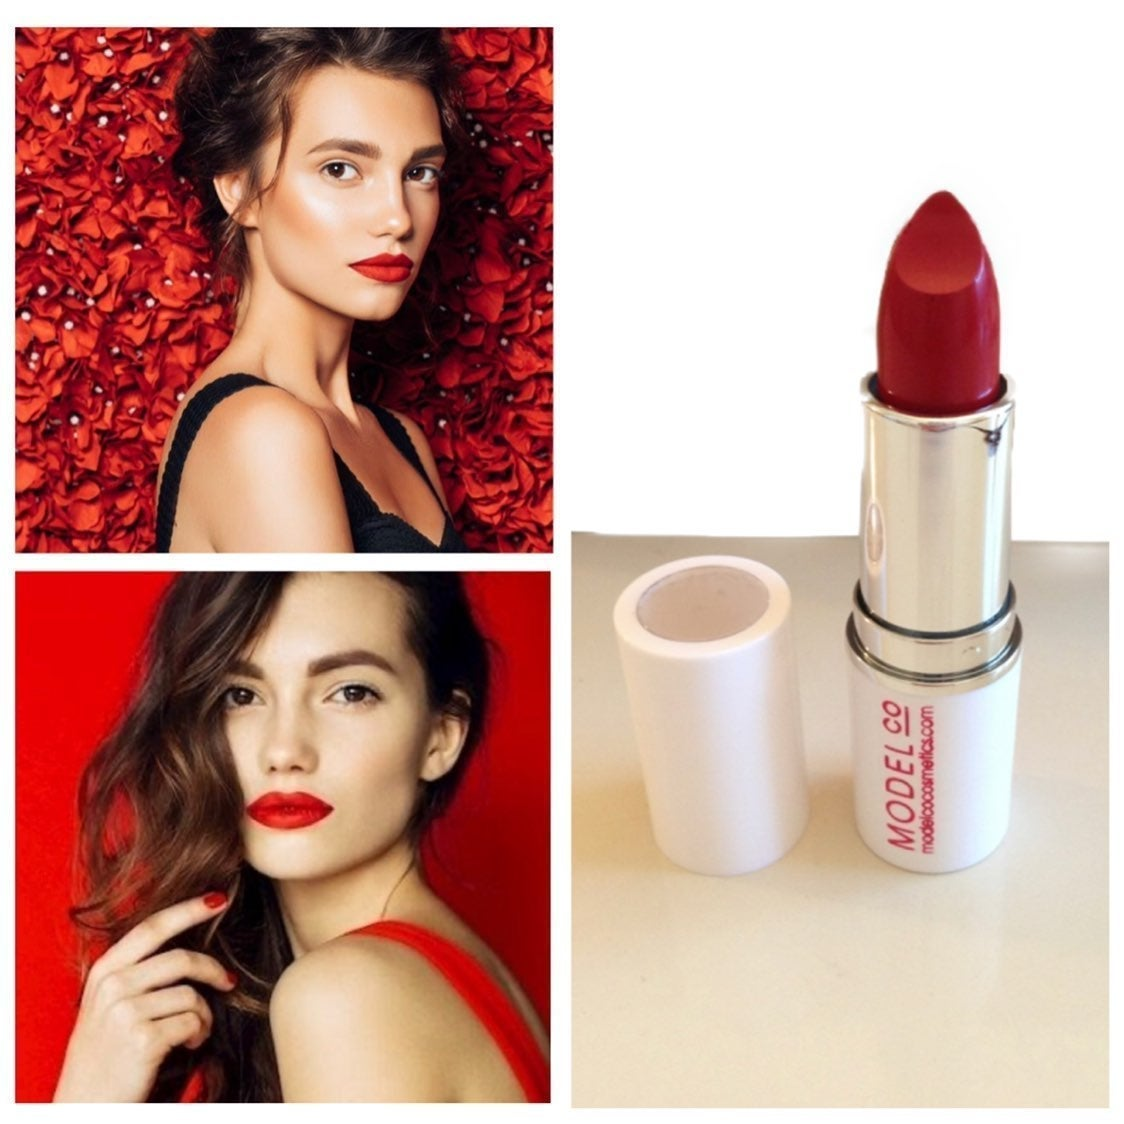 Model Co Party Proof Matte Lipstick Full